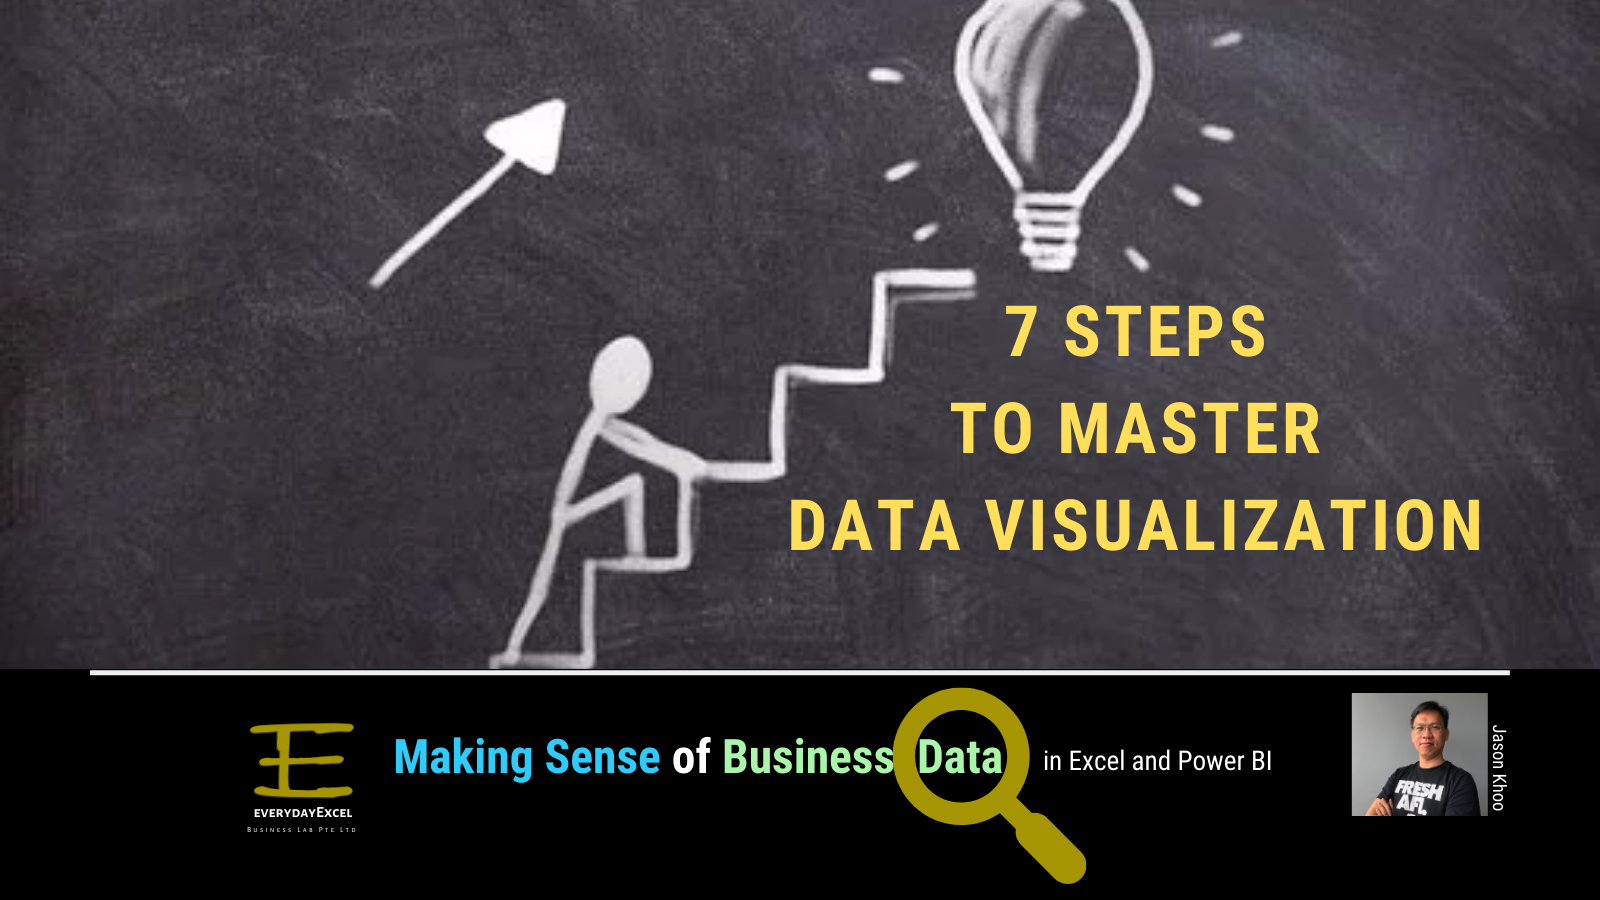 7-steps-to-master-data-visualization